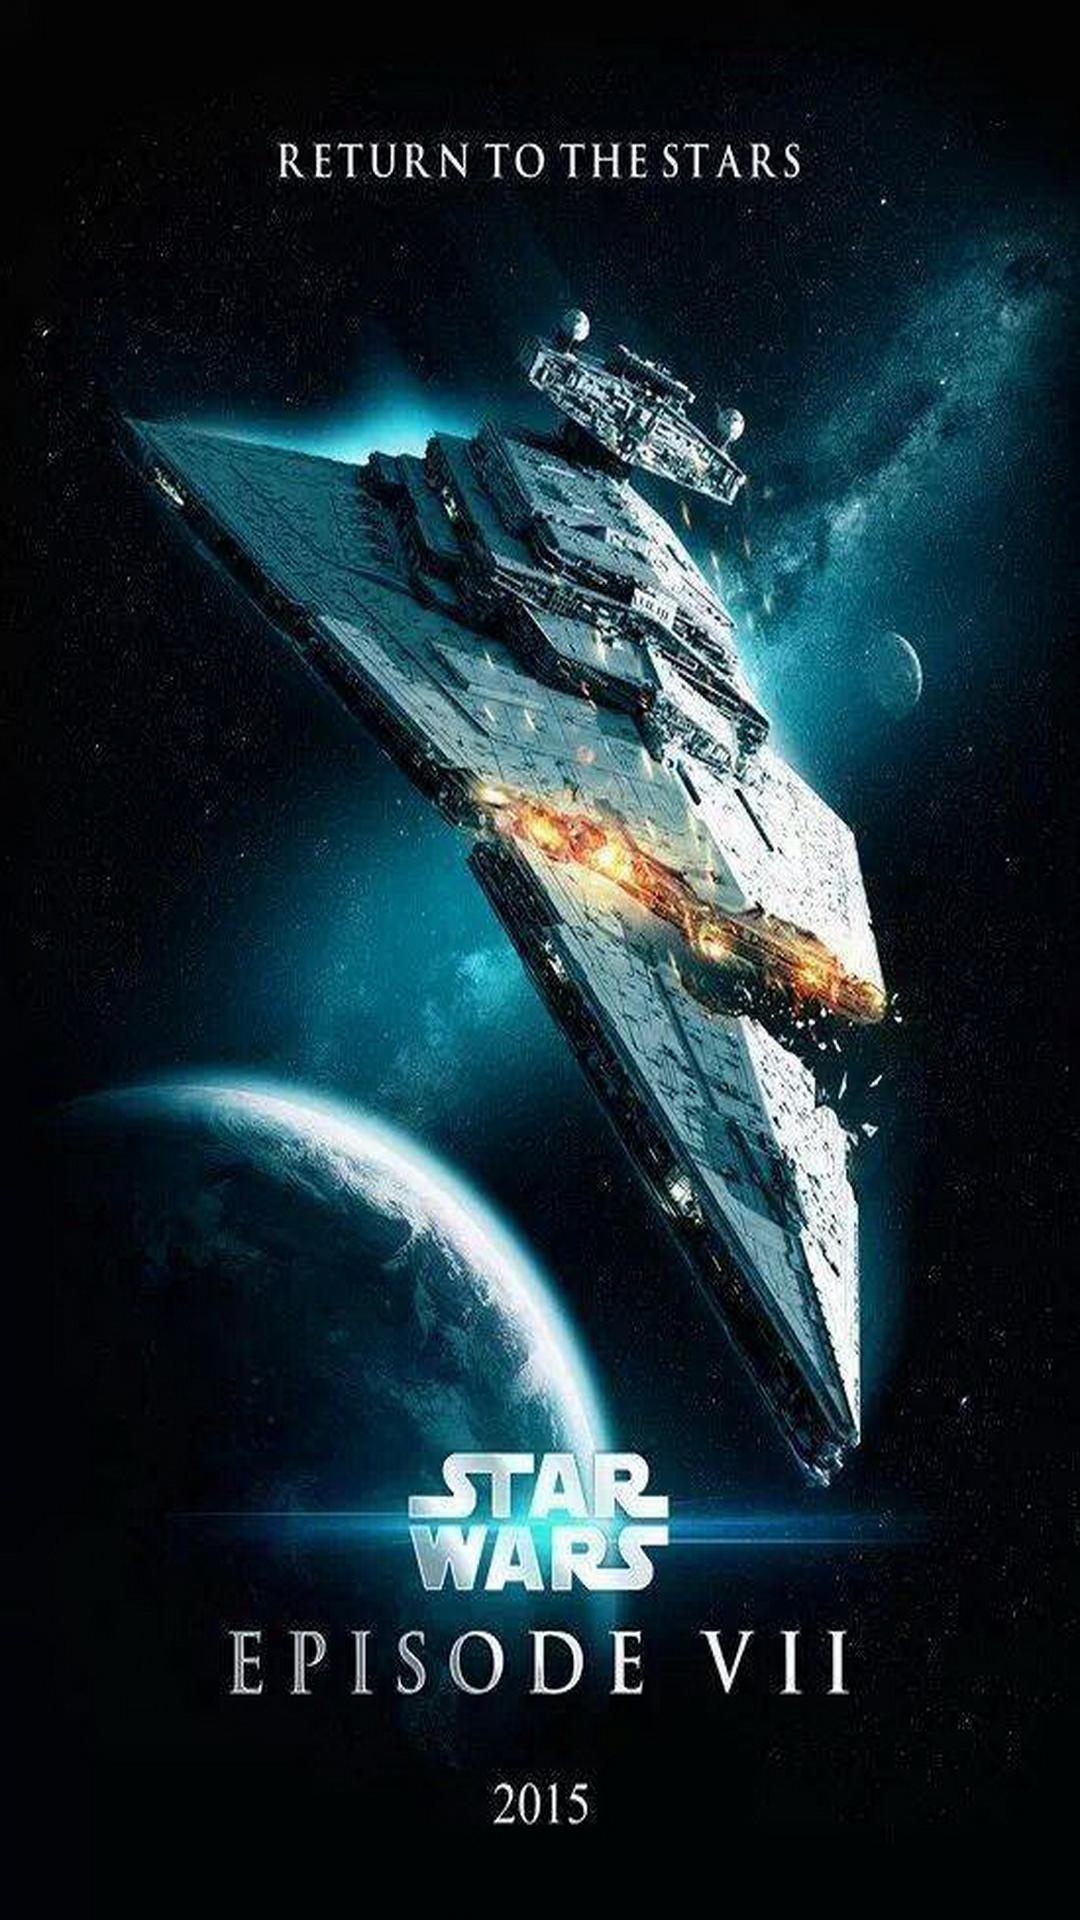 Star Wars Episode VII photos of Epic Star Wars Iphone Wallpaper 1080x1920